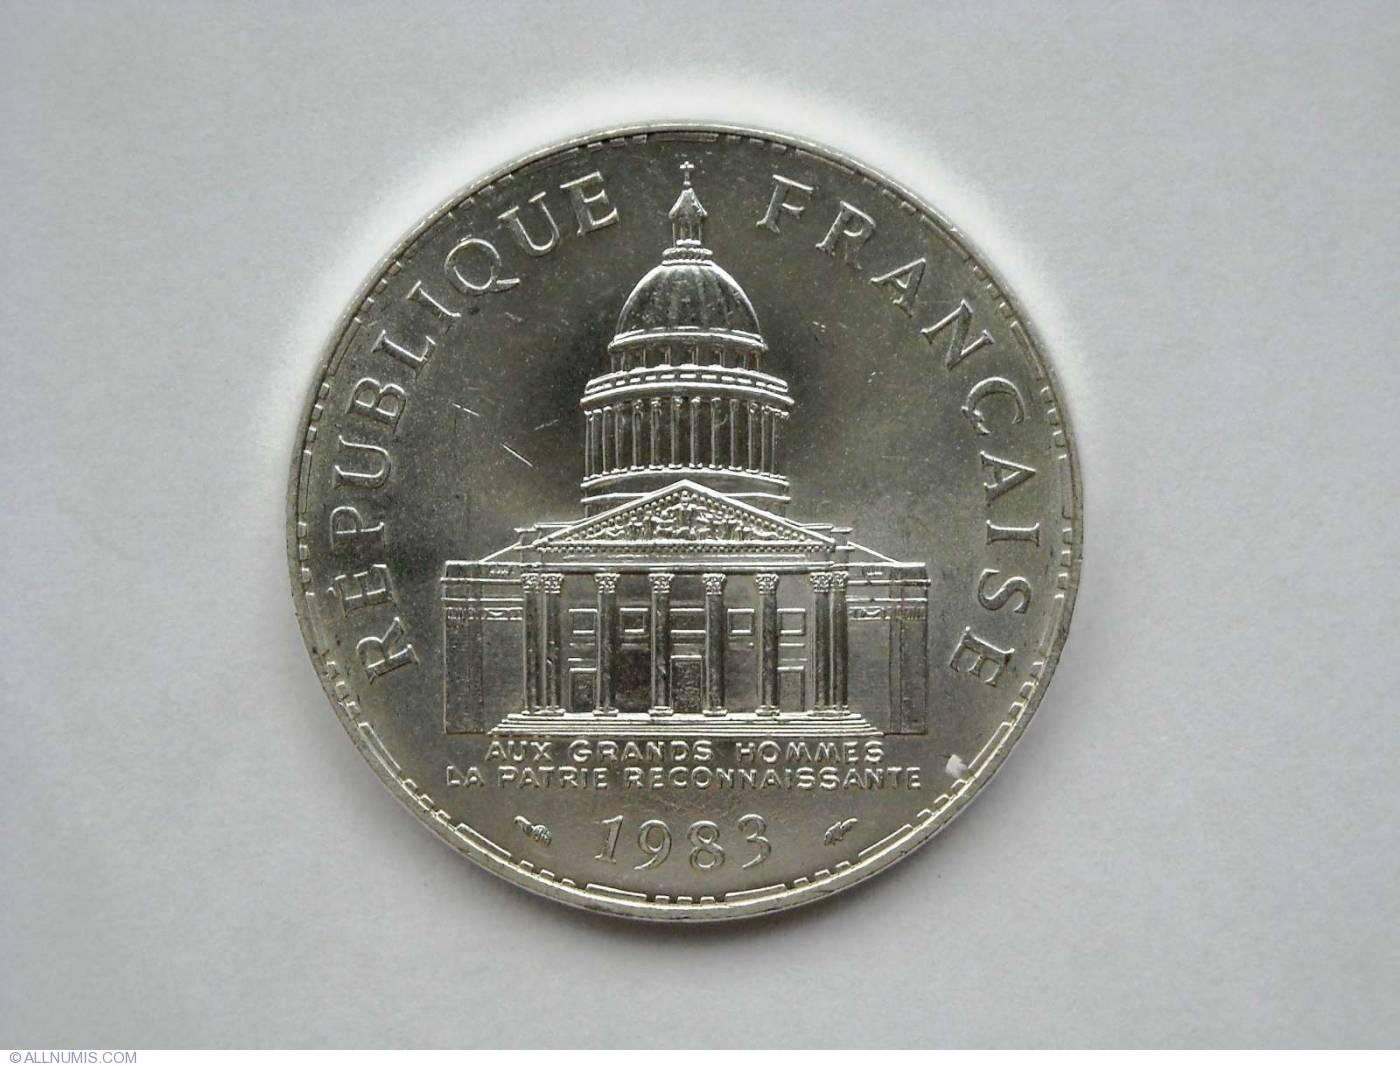 Coin sets of all Nations Chad 1976-1983 UNC 100 Francs 1982 500 Francs CAS 1976A